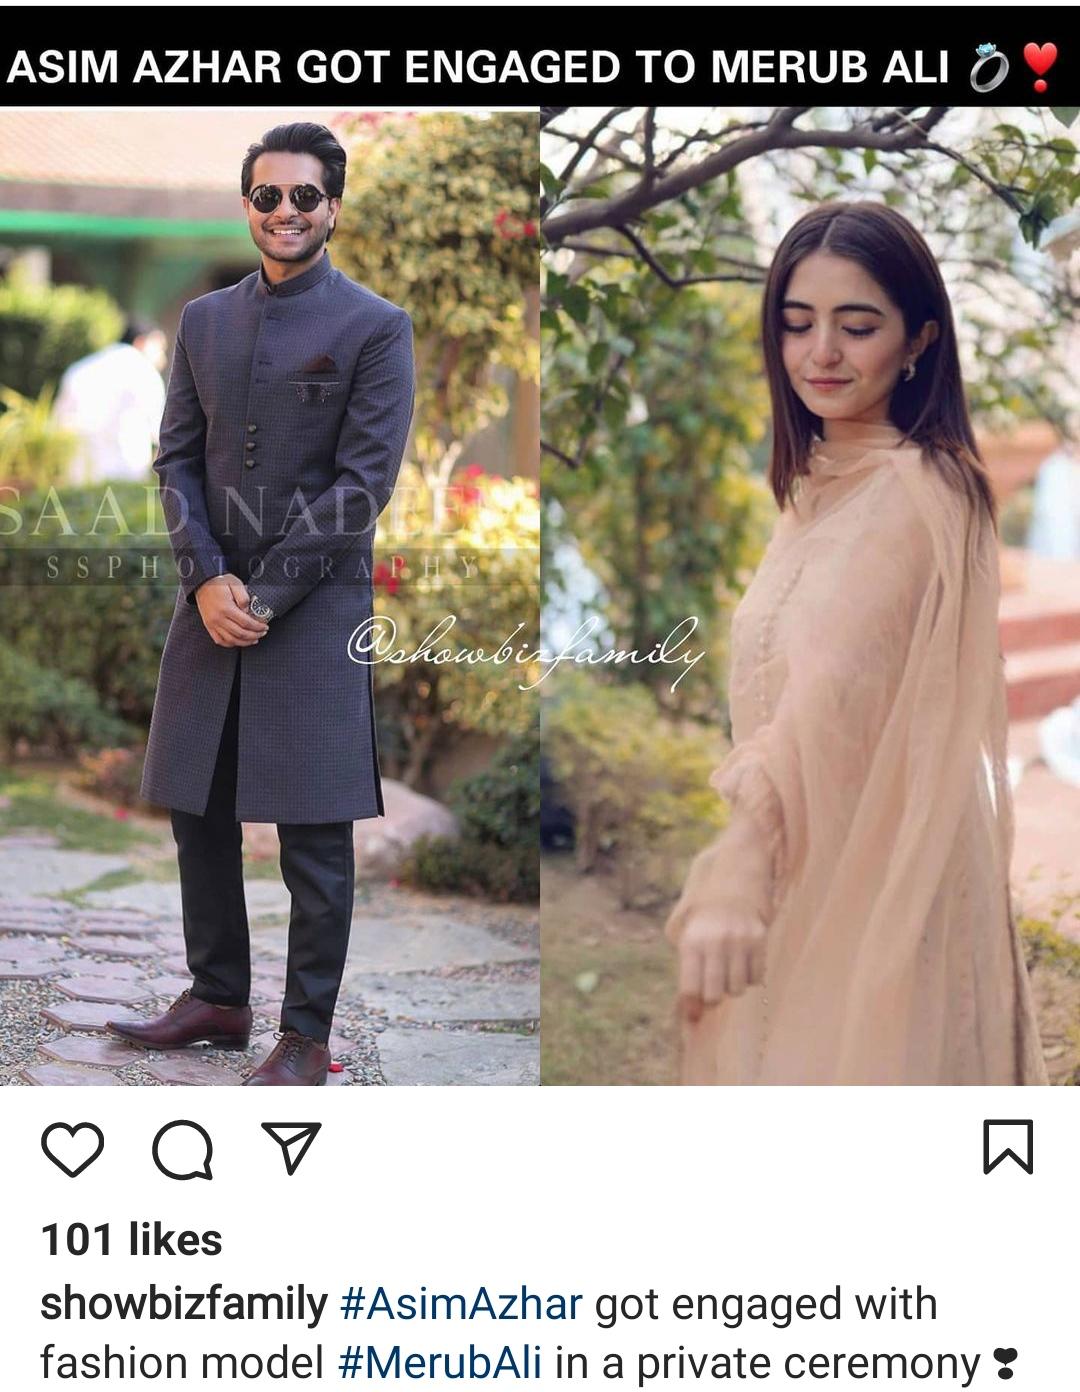 Asim Azhar Engagement with Merub Ali